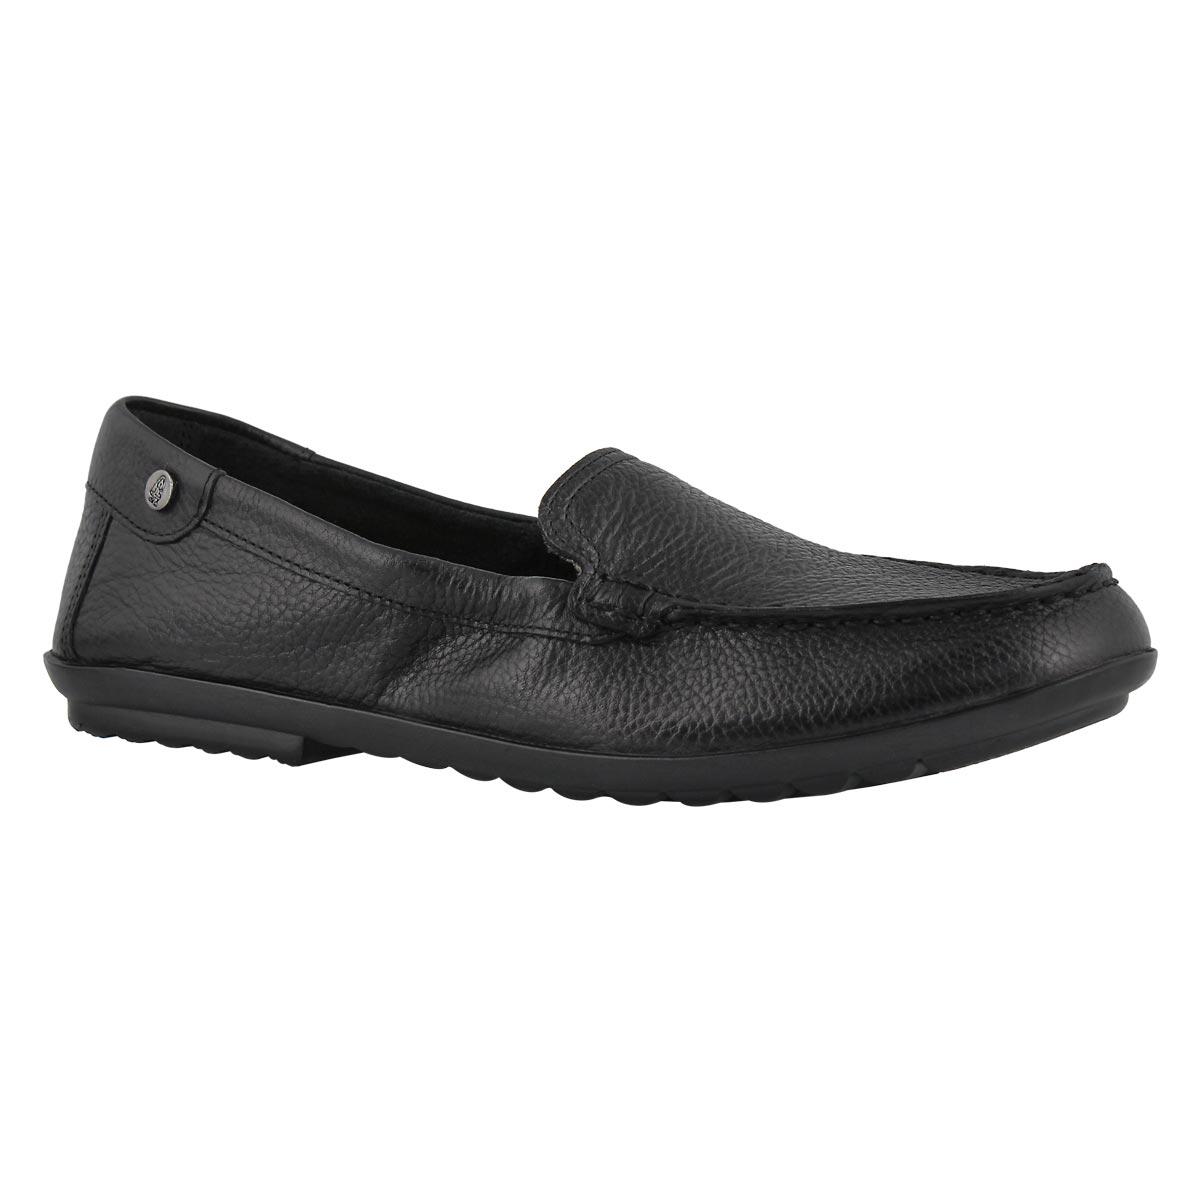 Lds Aidi Mocc black casual slip on